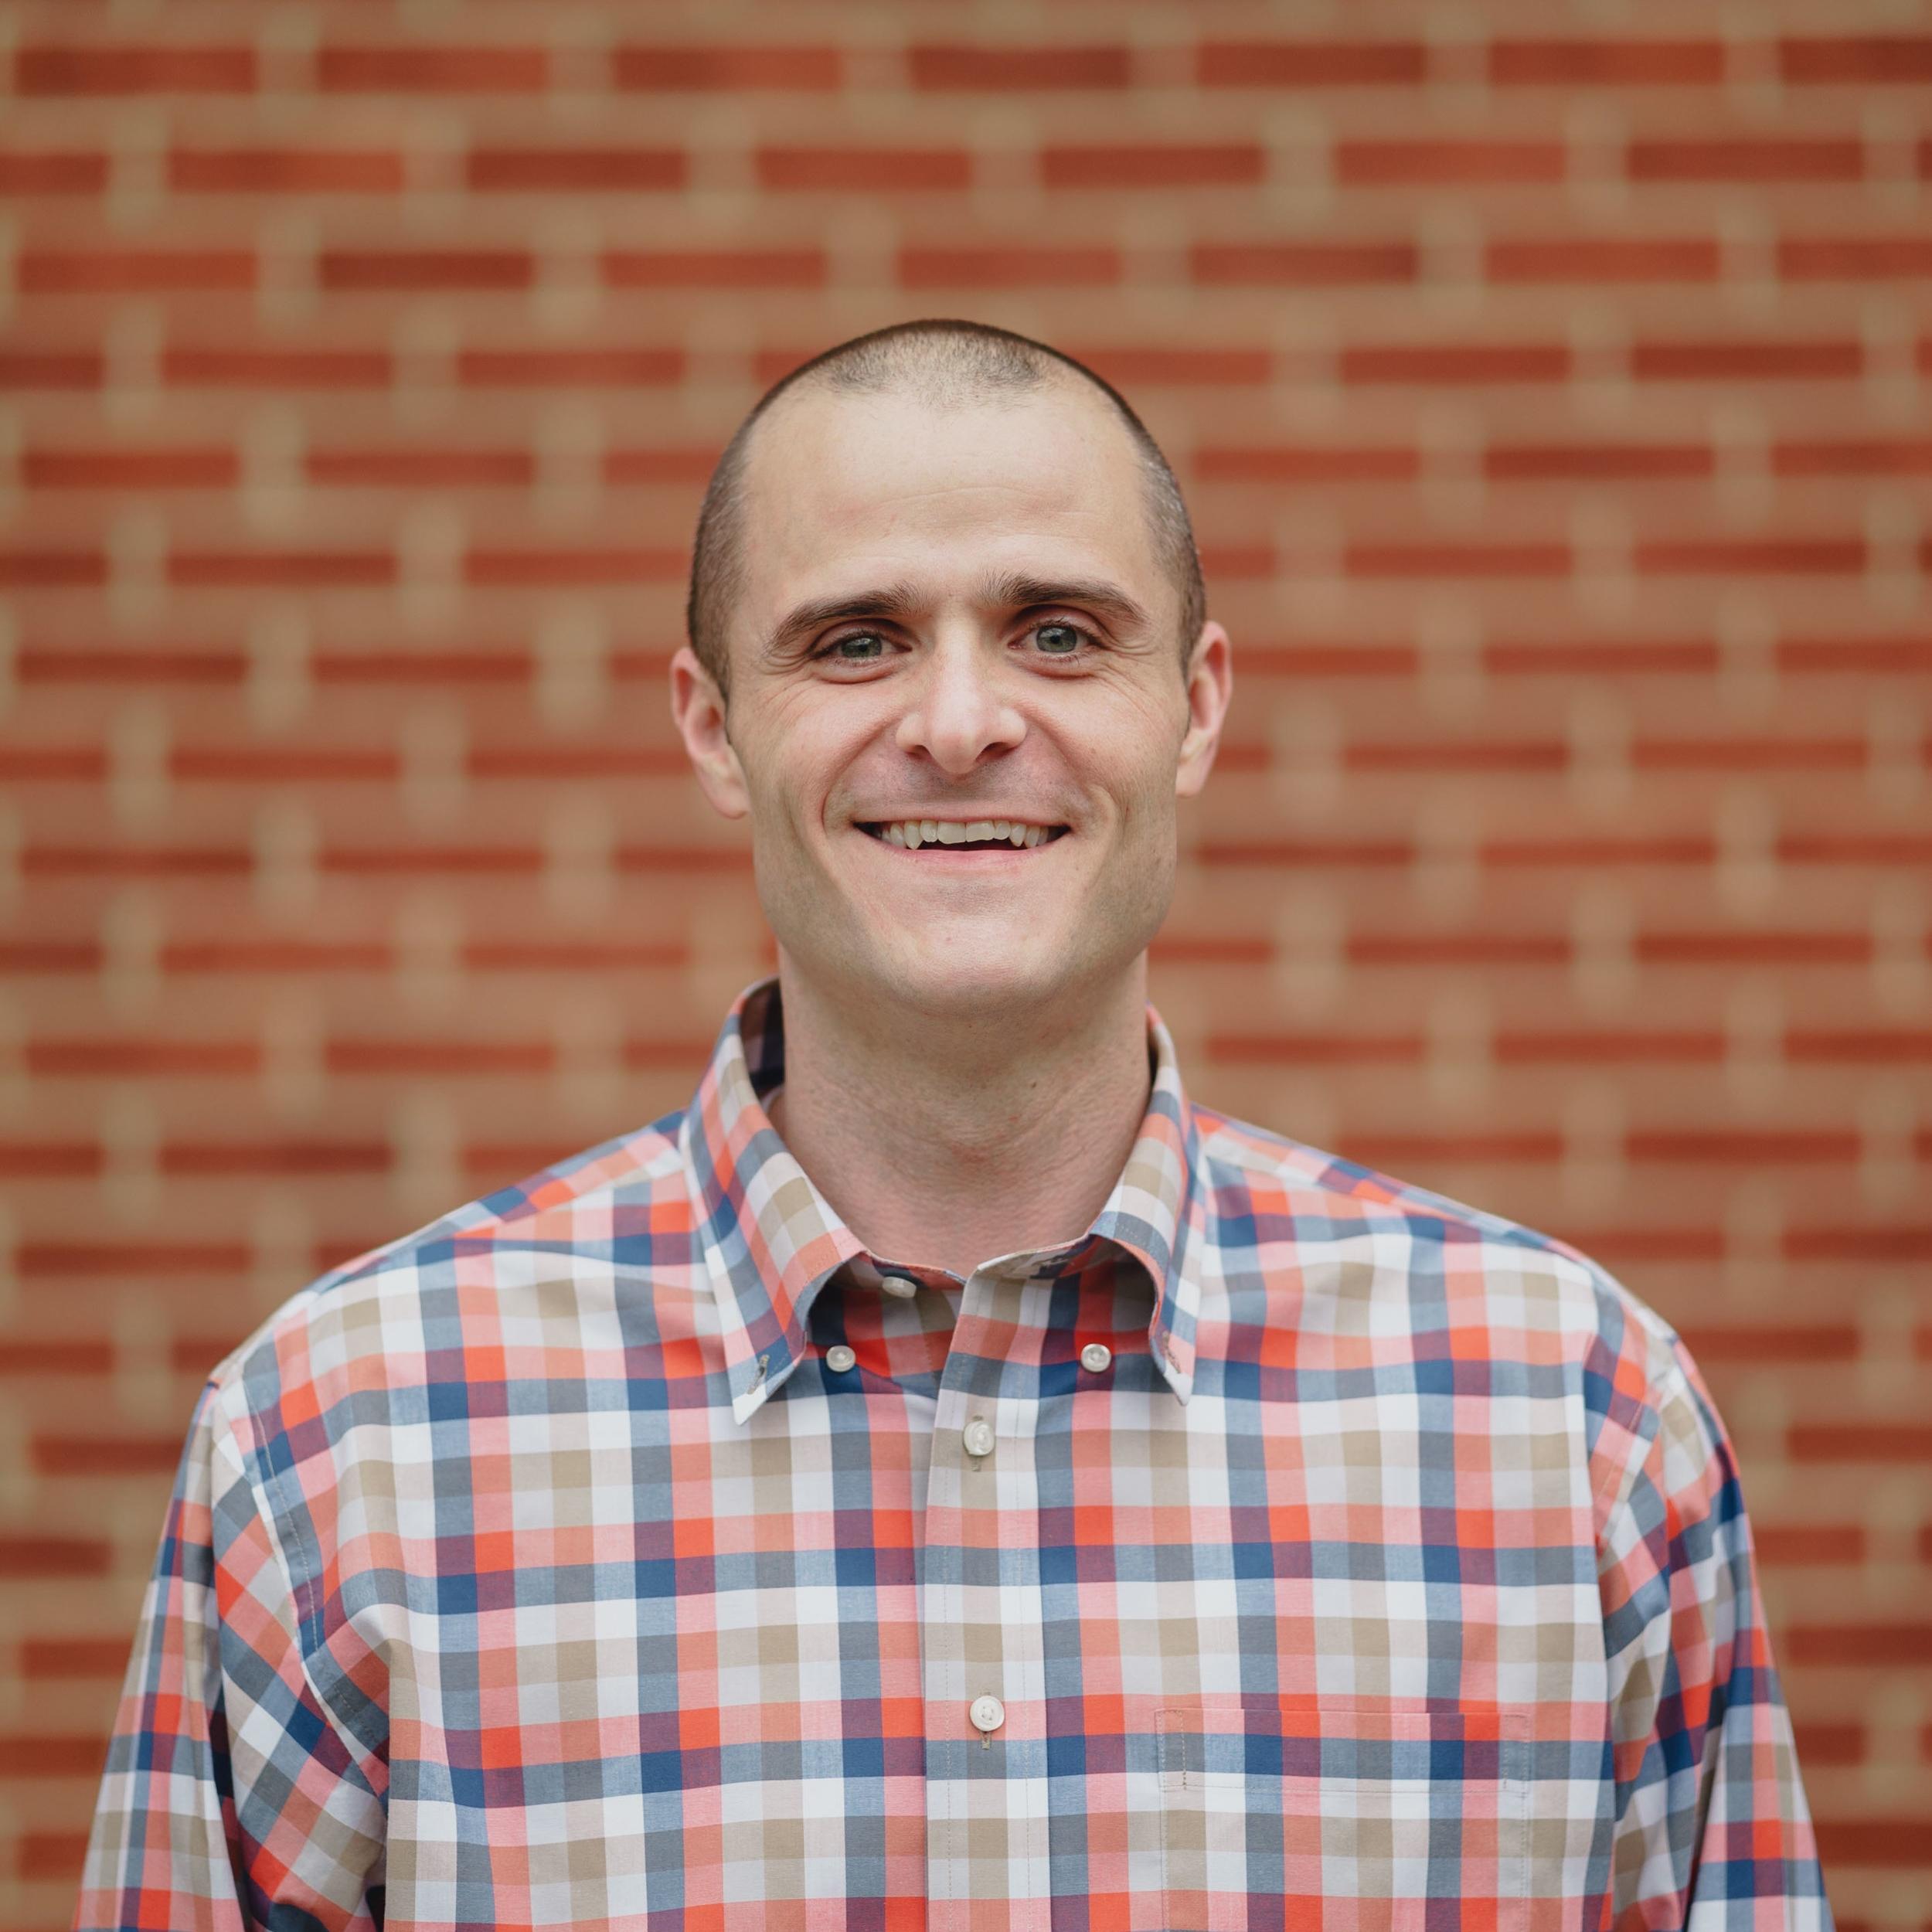 Brad KirbySenior Pastor - bkirby@fbcwoodbridge.org